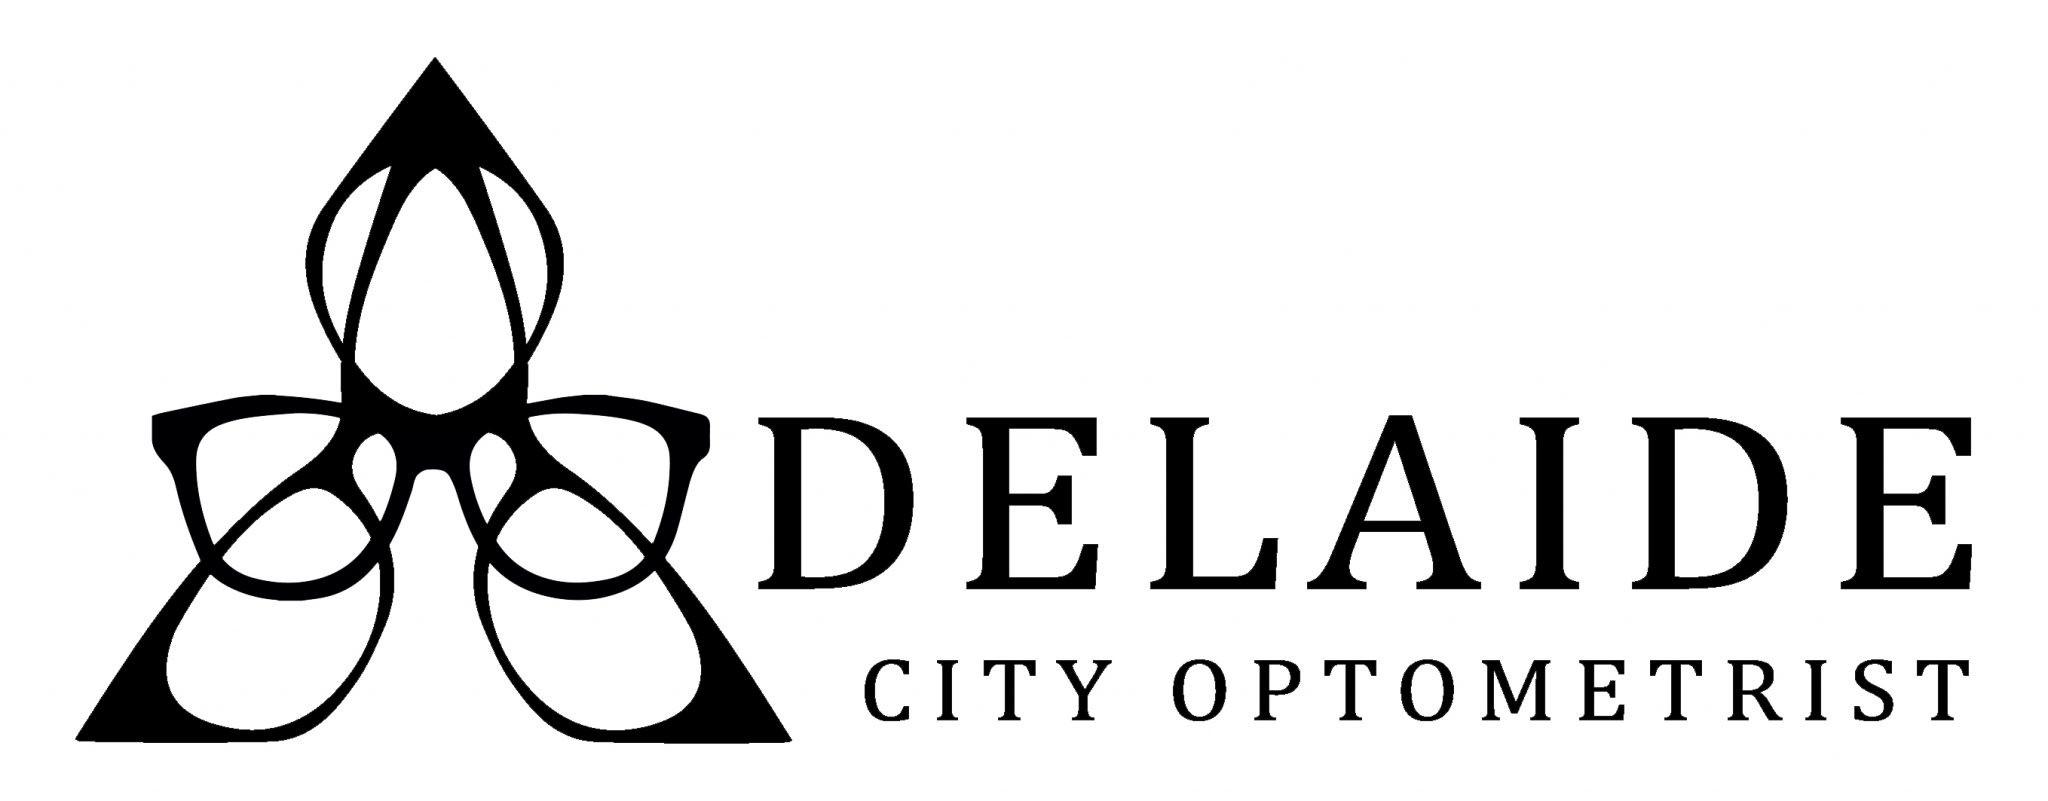 Adelaide City Optometrist